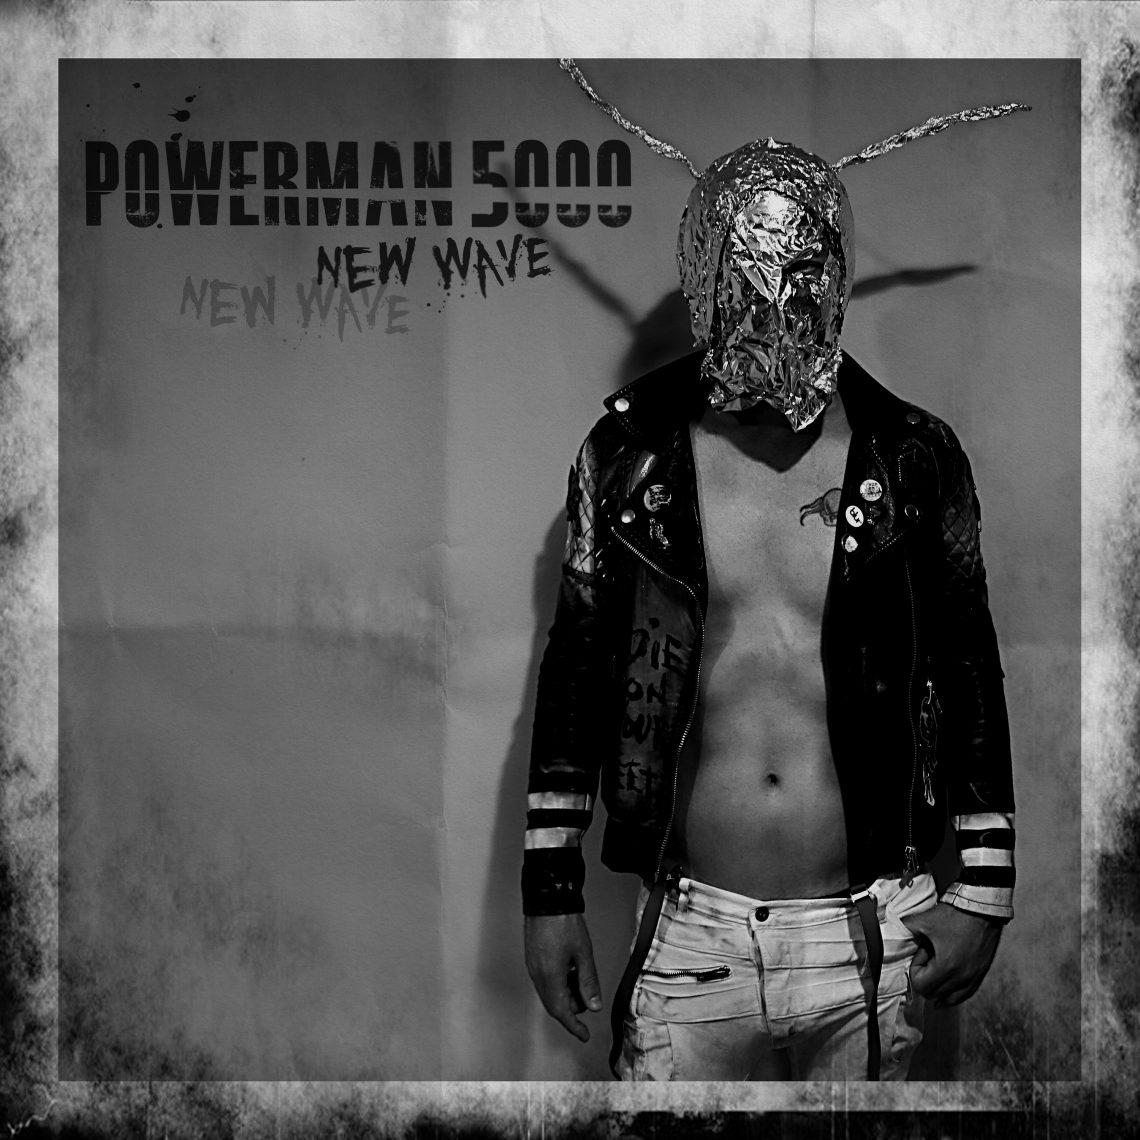 Powerman 5000 – New Wave